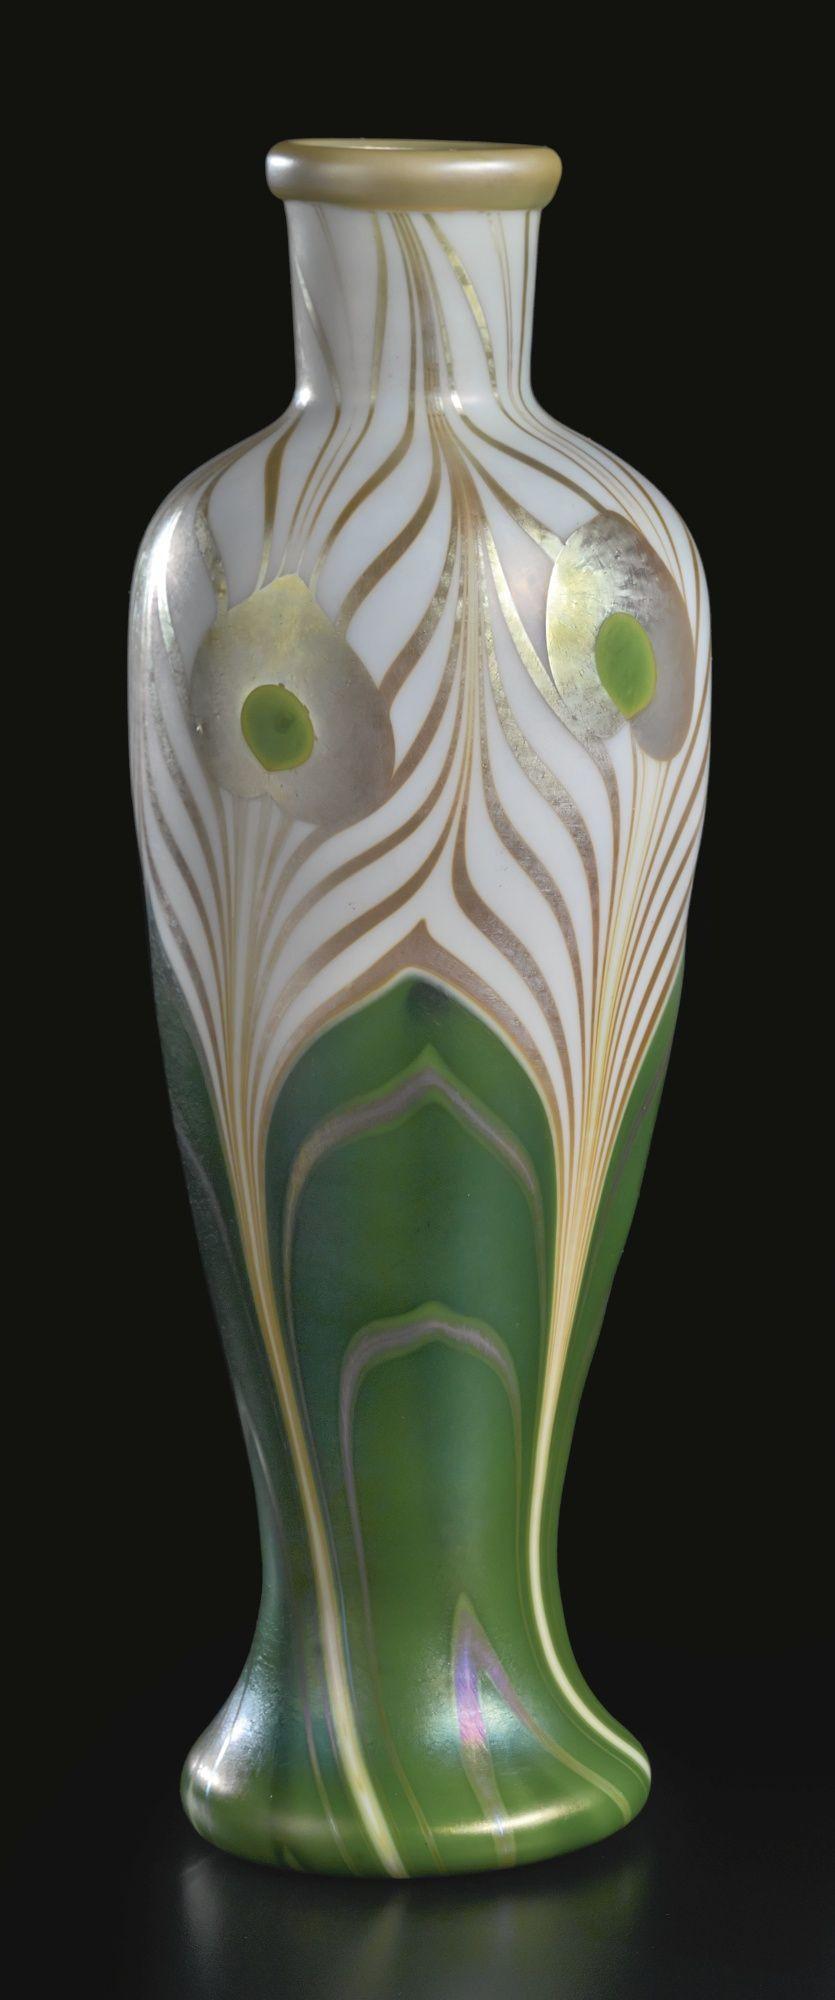 steuben glass vase of steuben glass works art deco pinterest steuben glass glass with steuben glass works